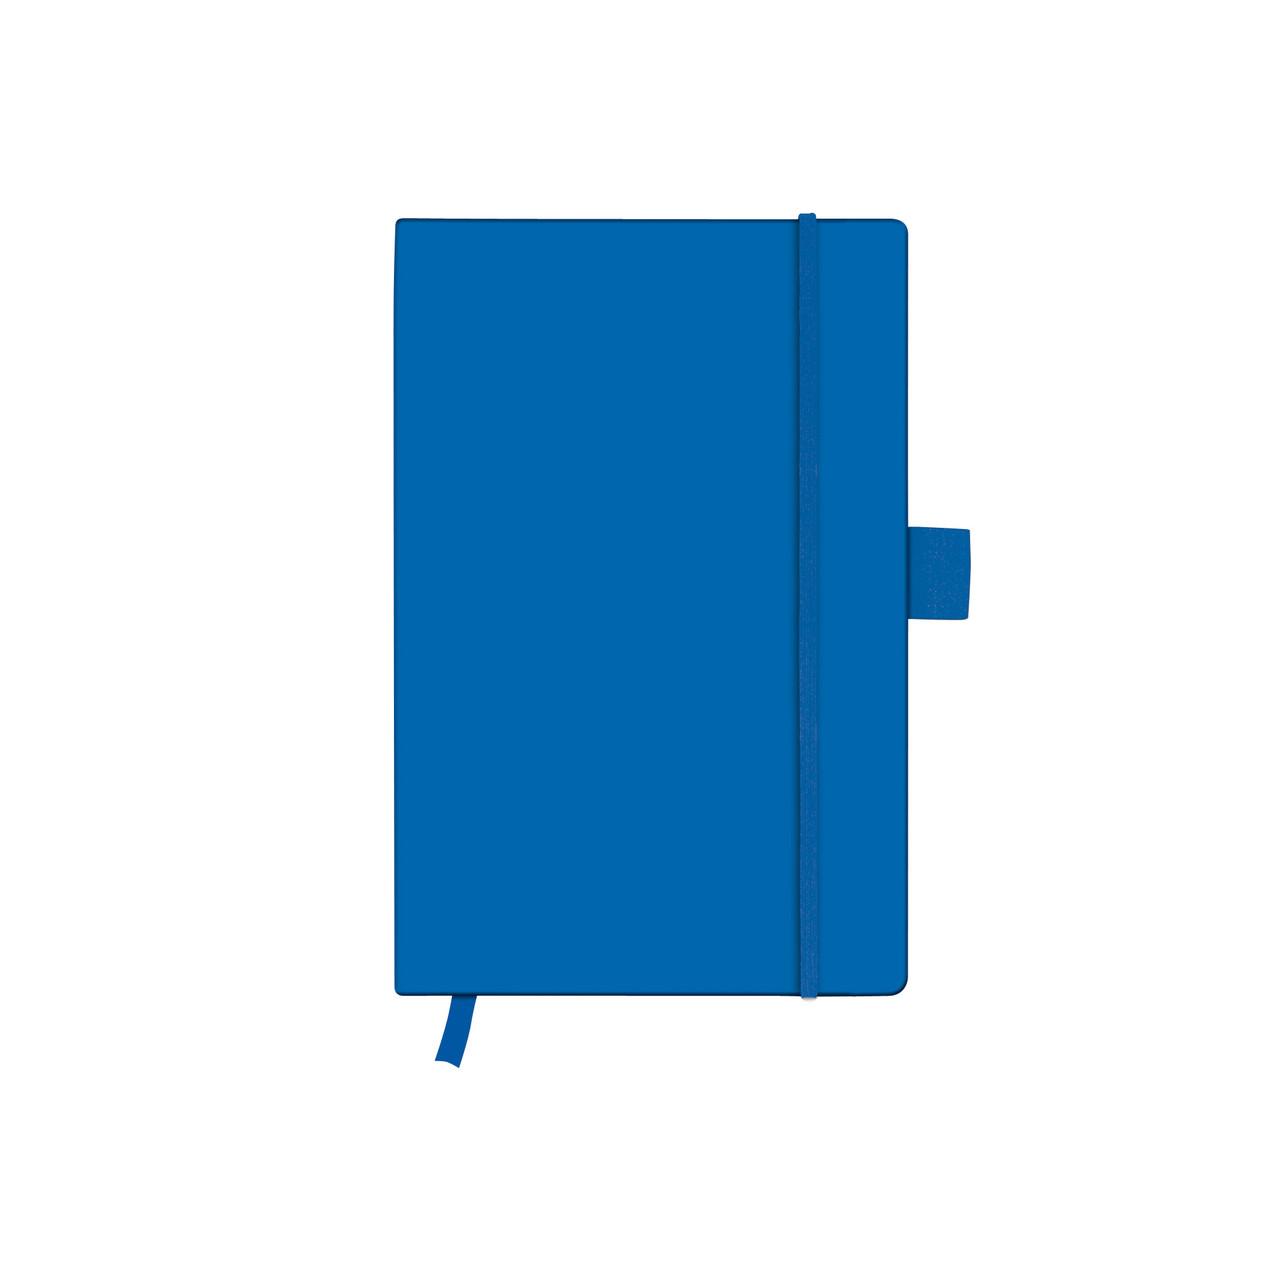 Записная книга Herlitz А6 96л My.Book Classic Blue клетка обложка имитация кожи (11369162)